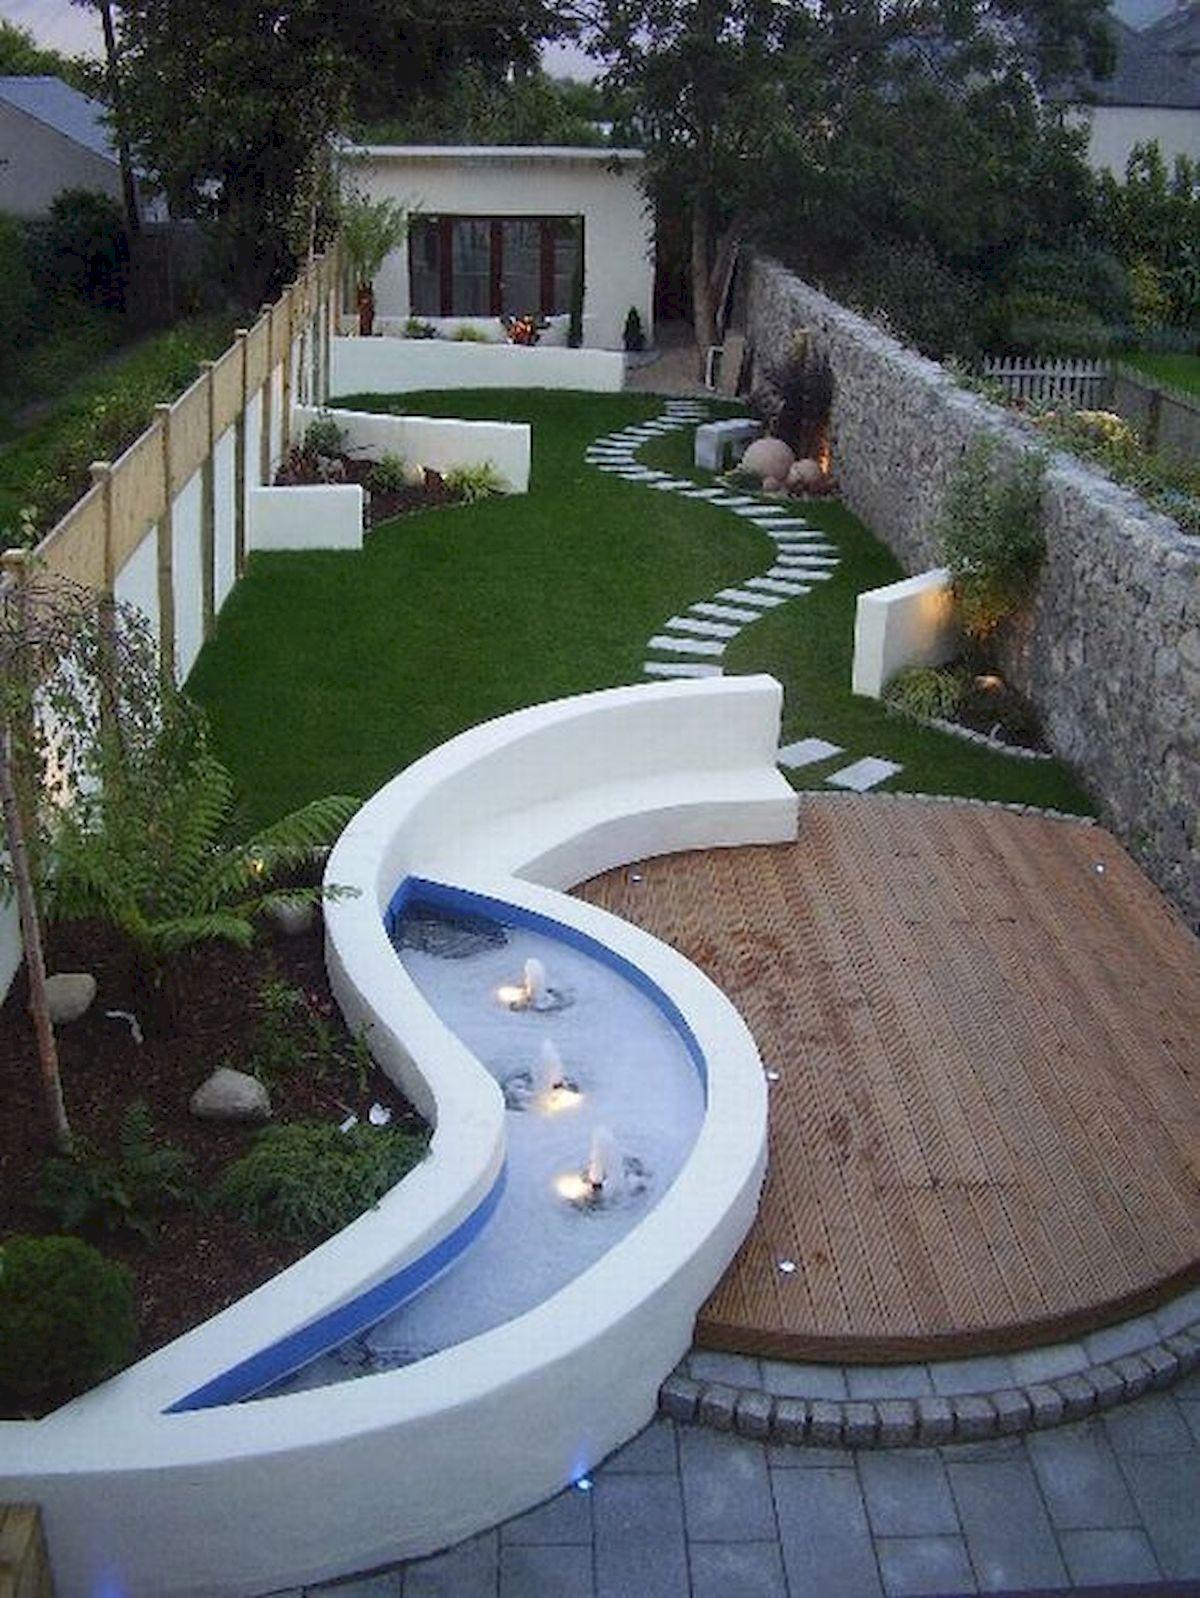 40 Fabulous Modern Garden Designs Ideas For Front Yard and Backyard (20)